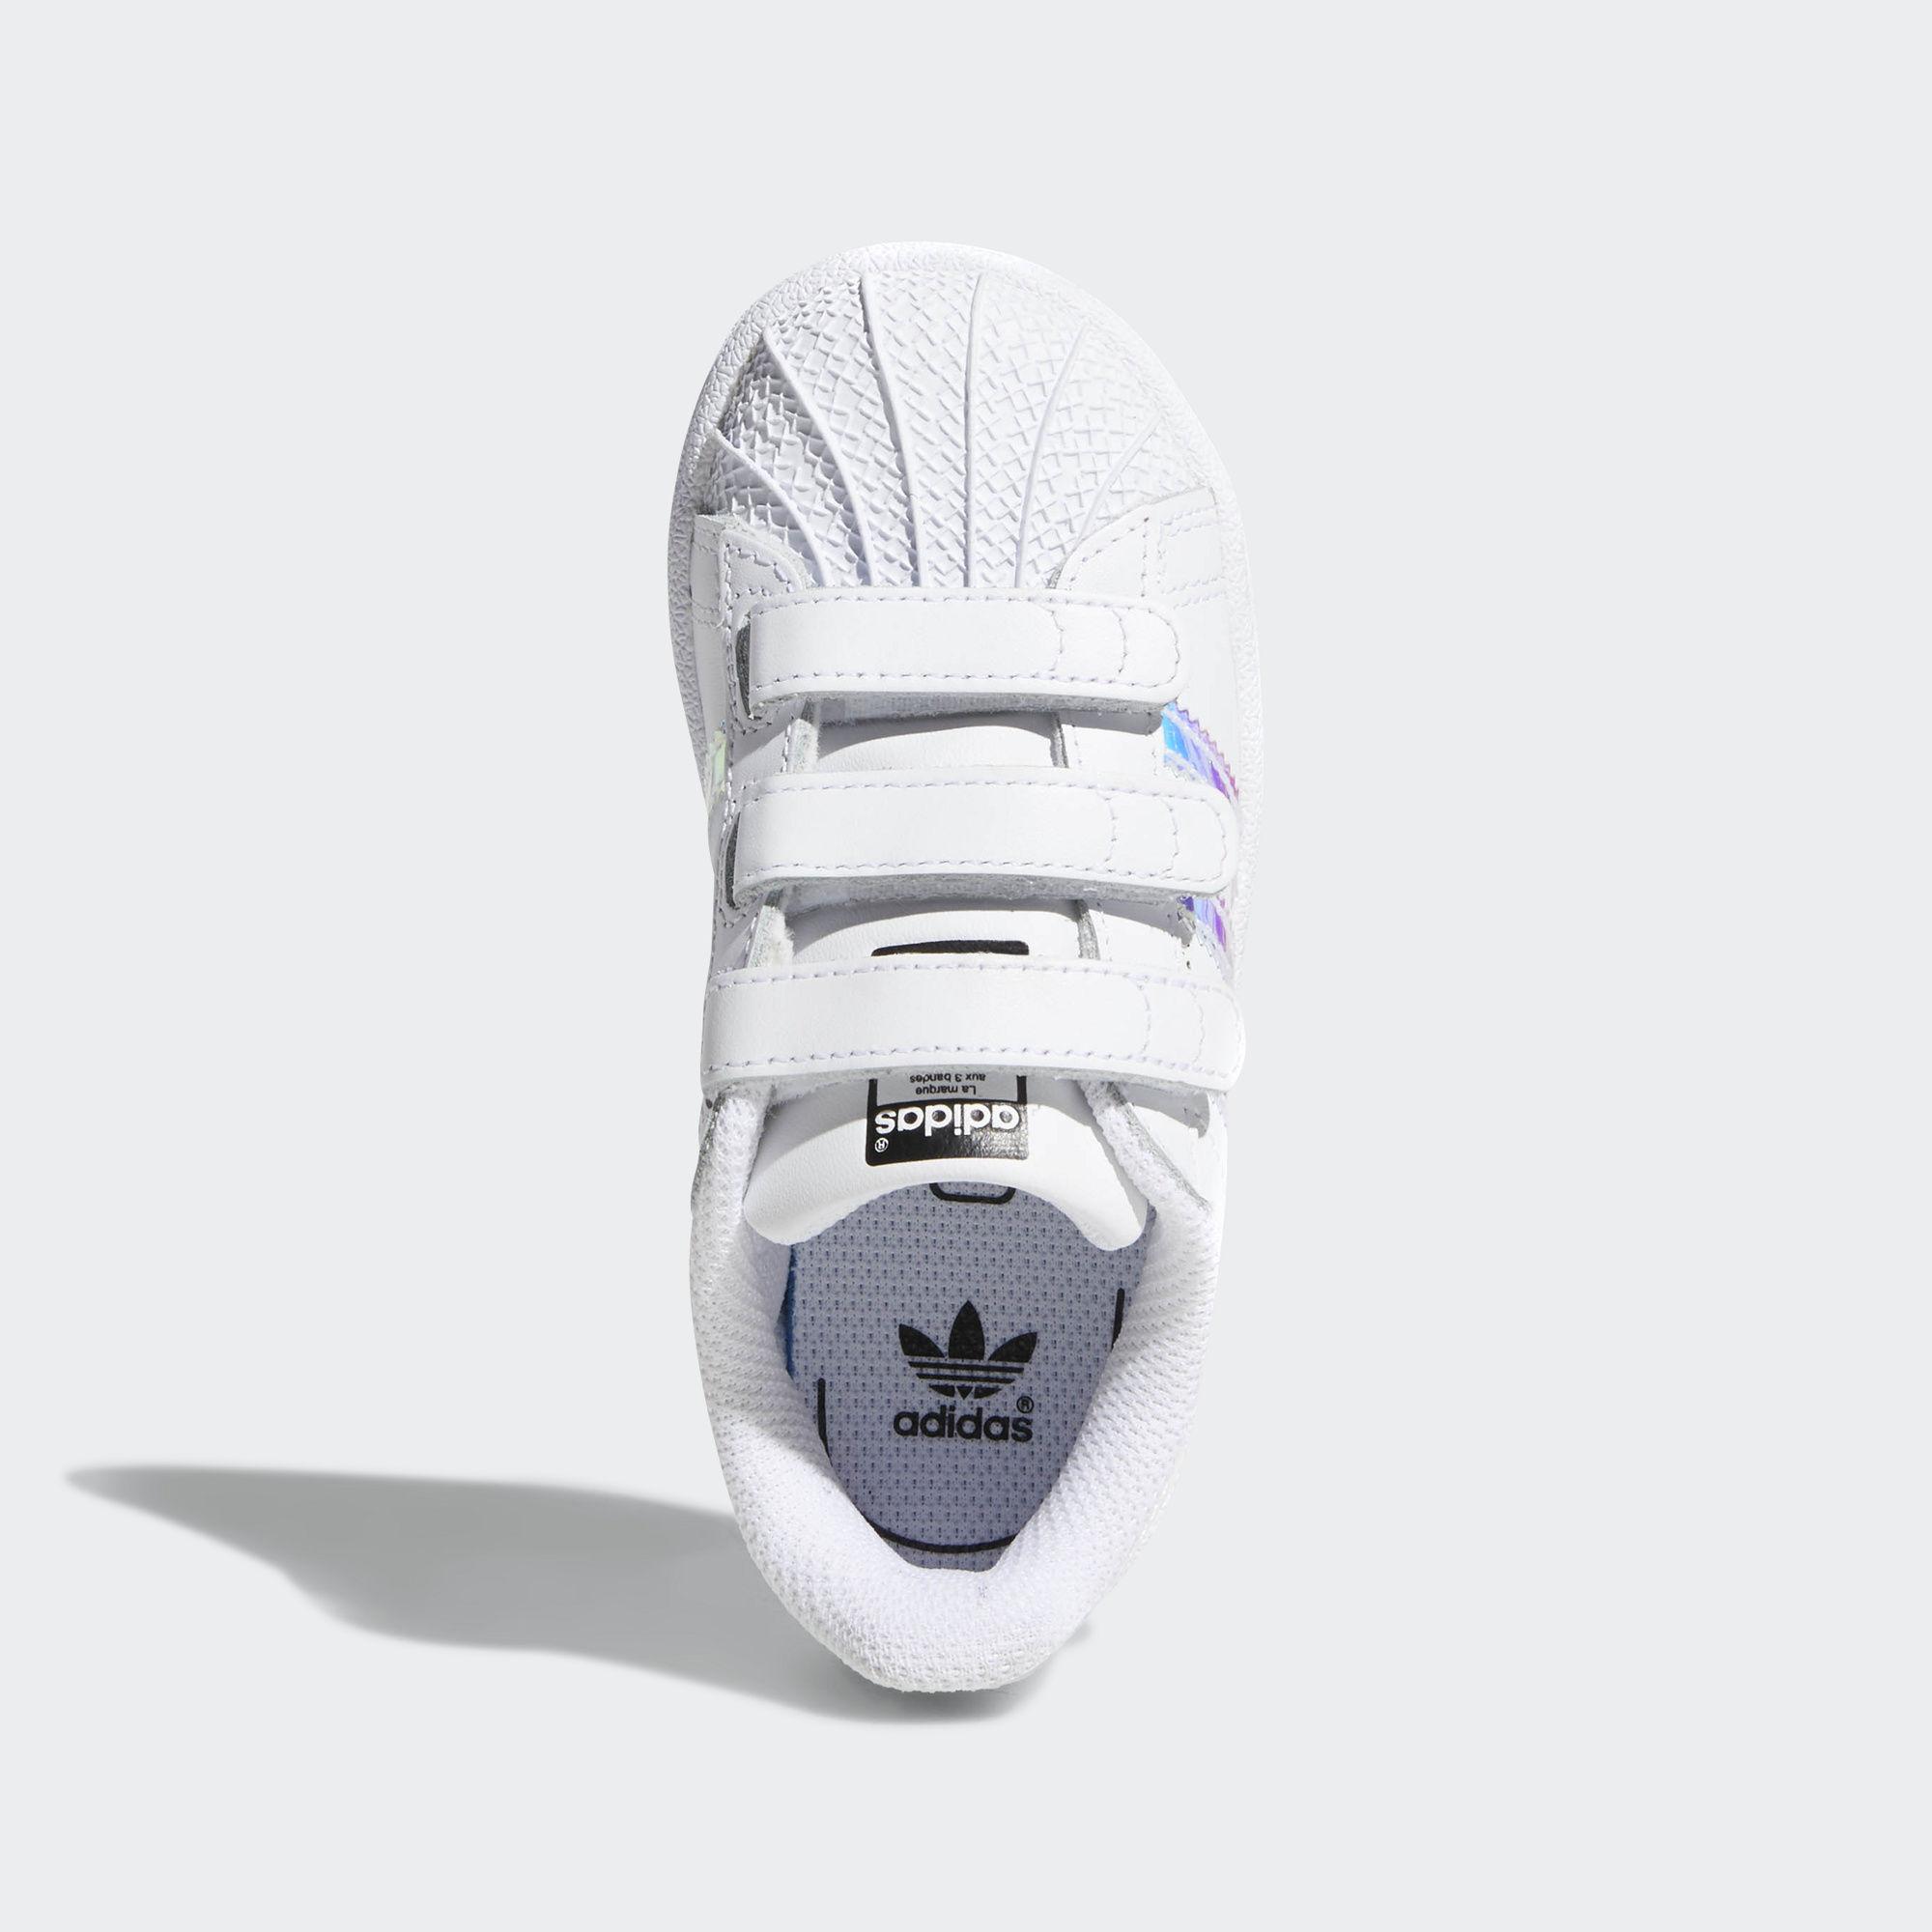 Superstar AQ6280 Adidas Originals